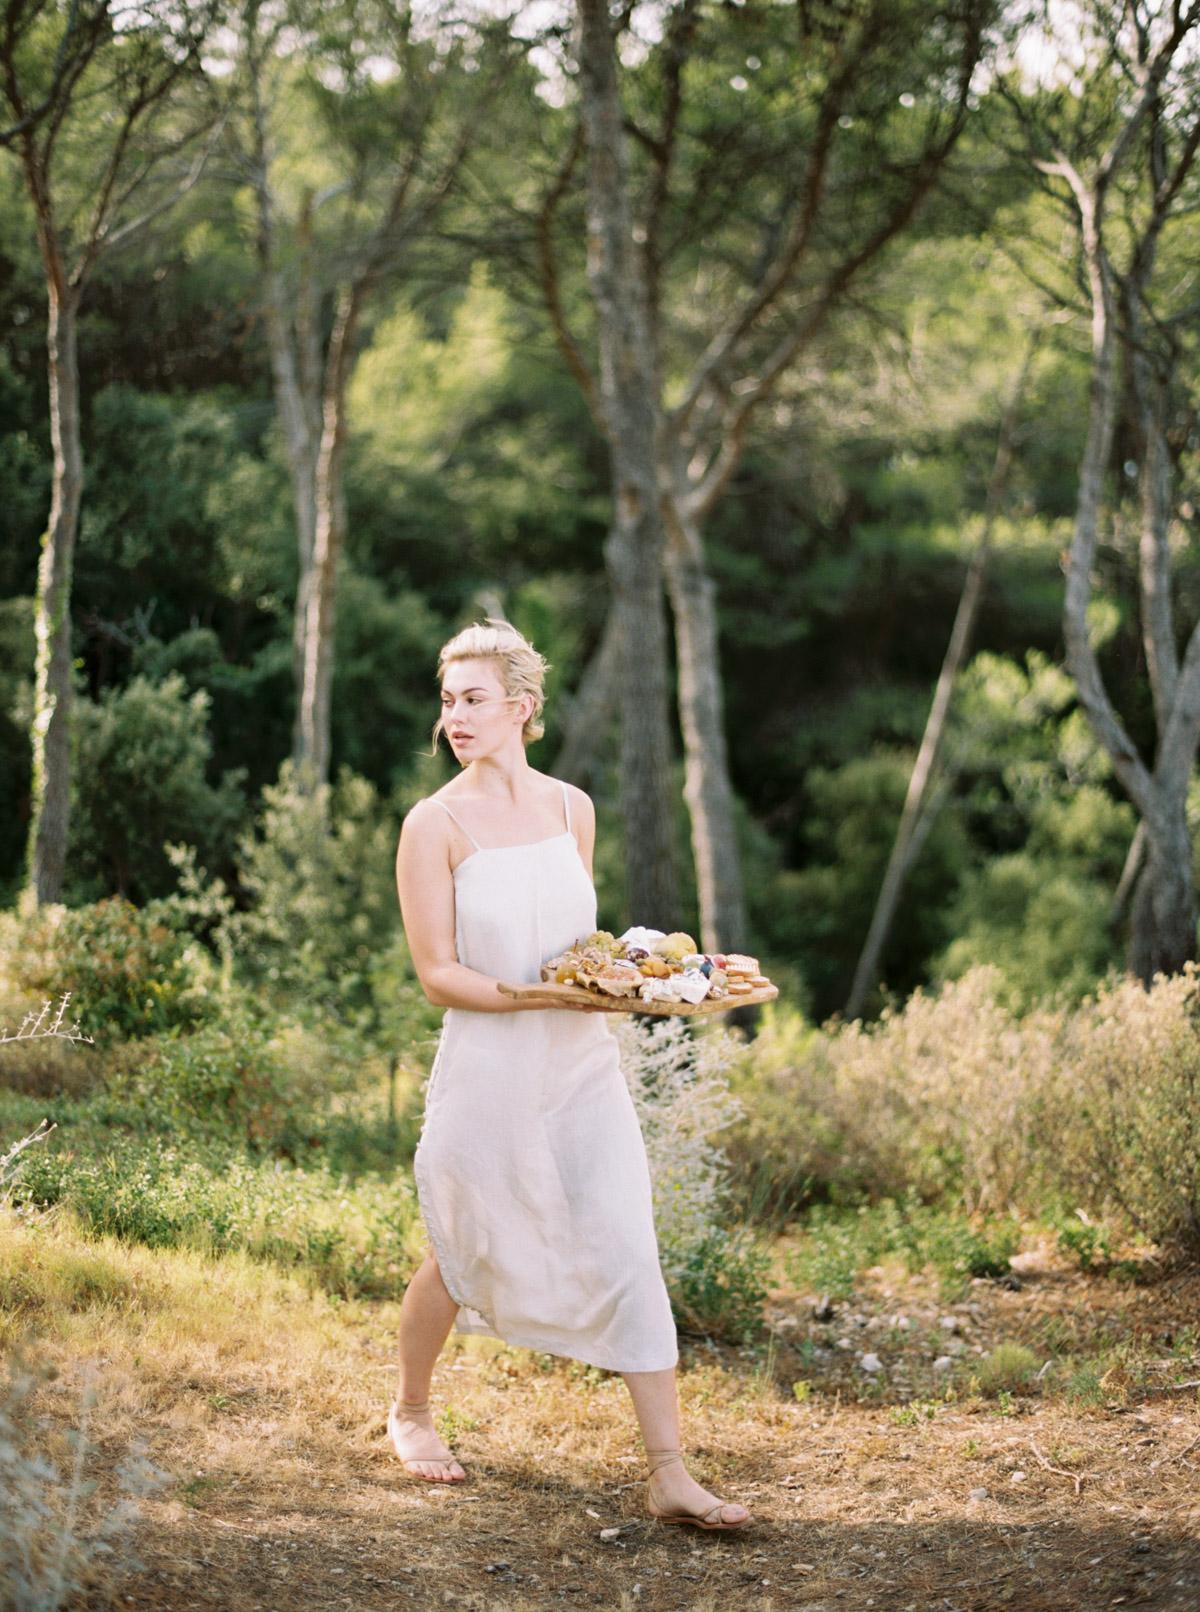 Katie Grant Photography (49 of 165).jpg